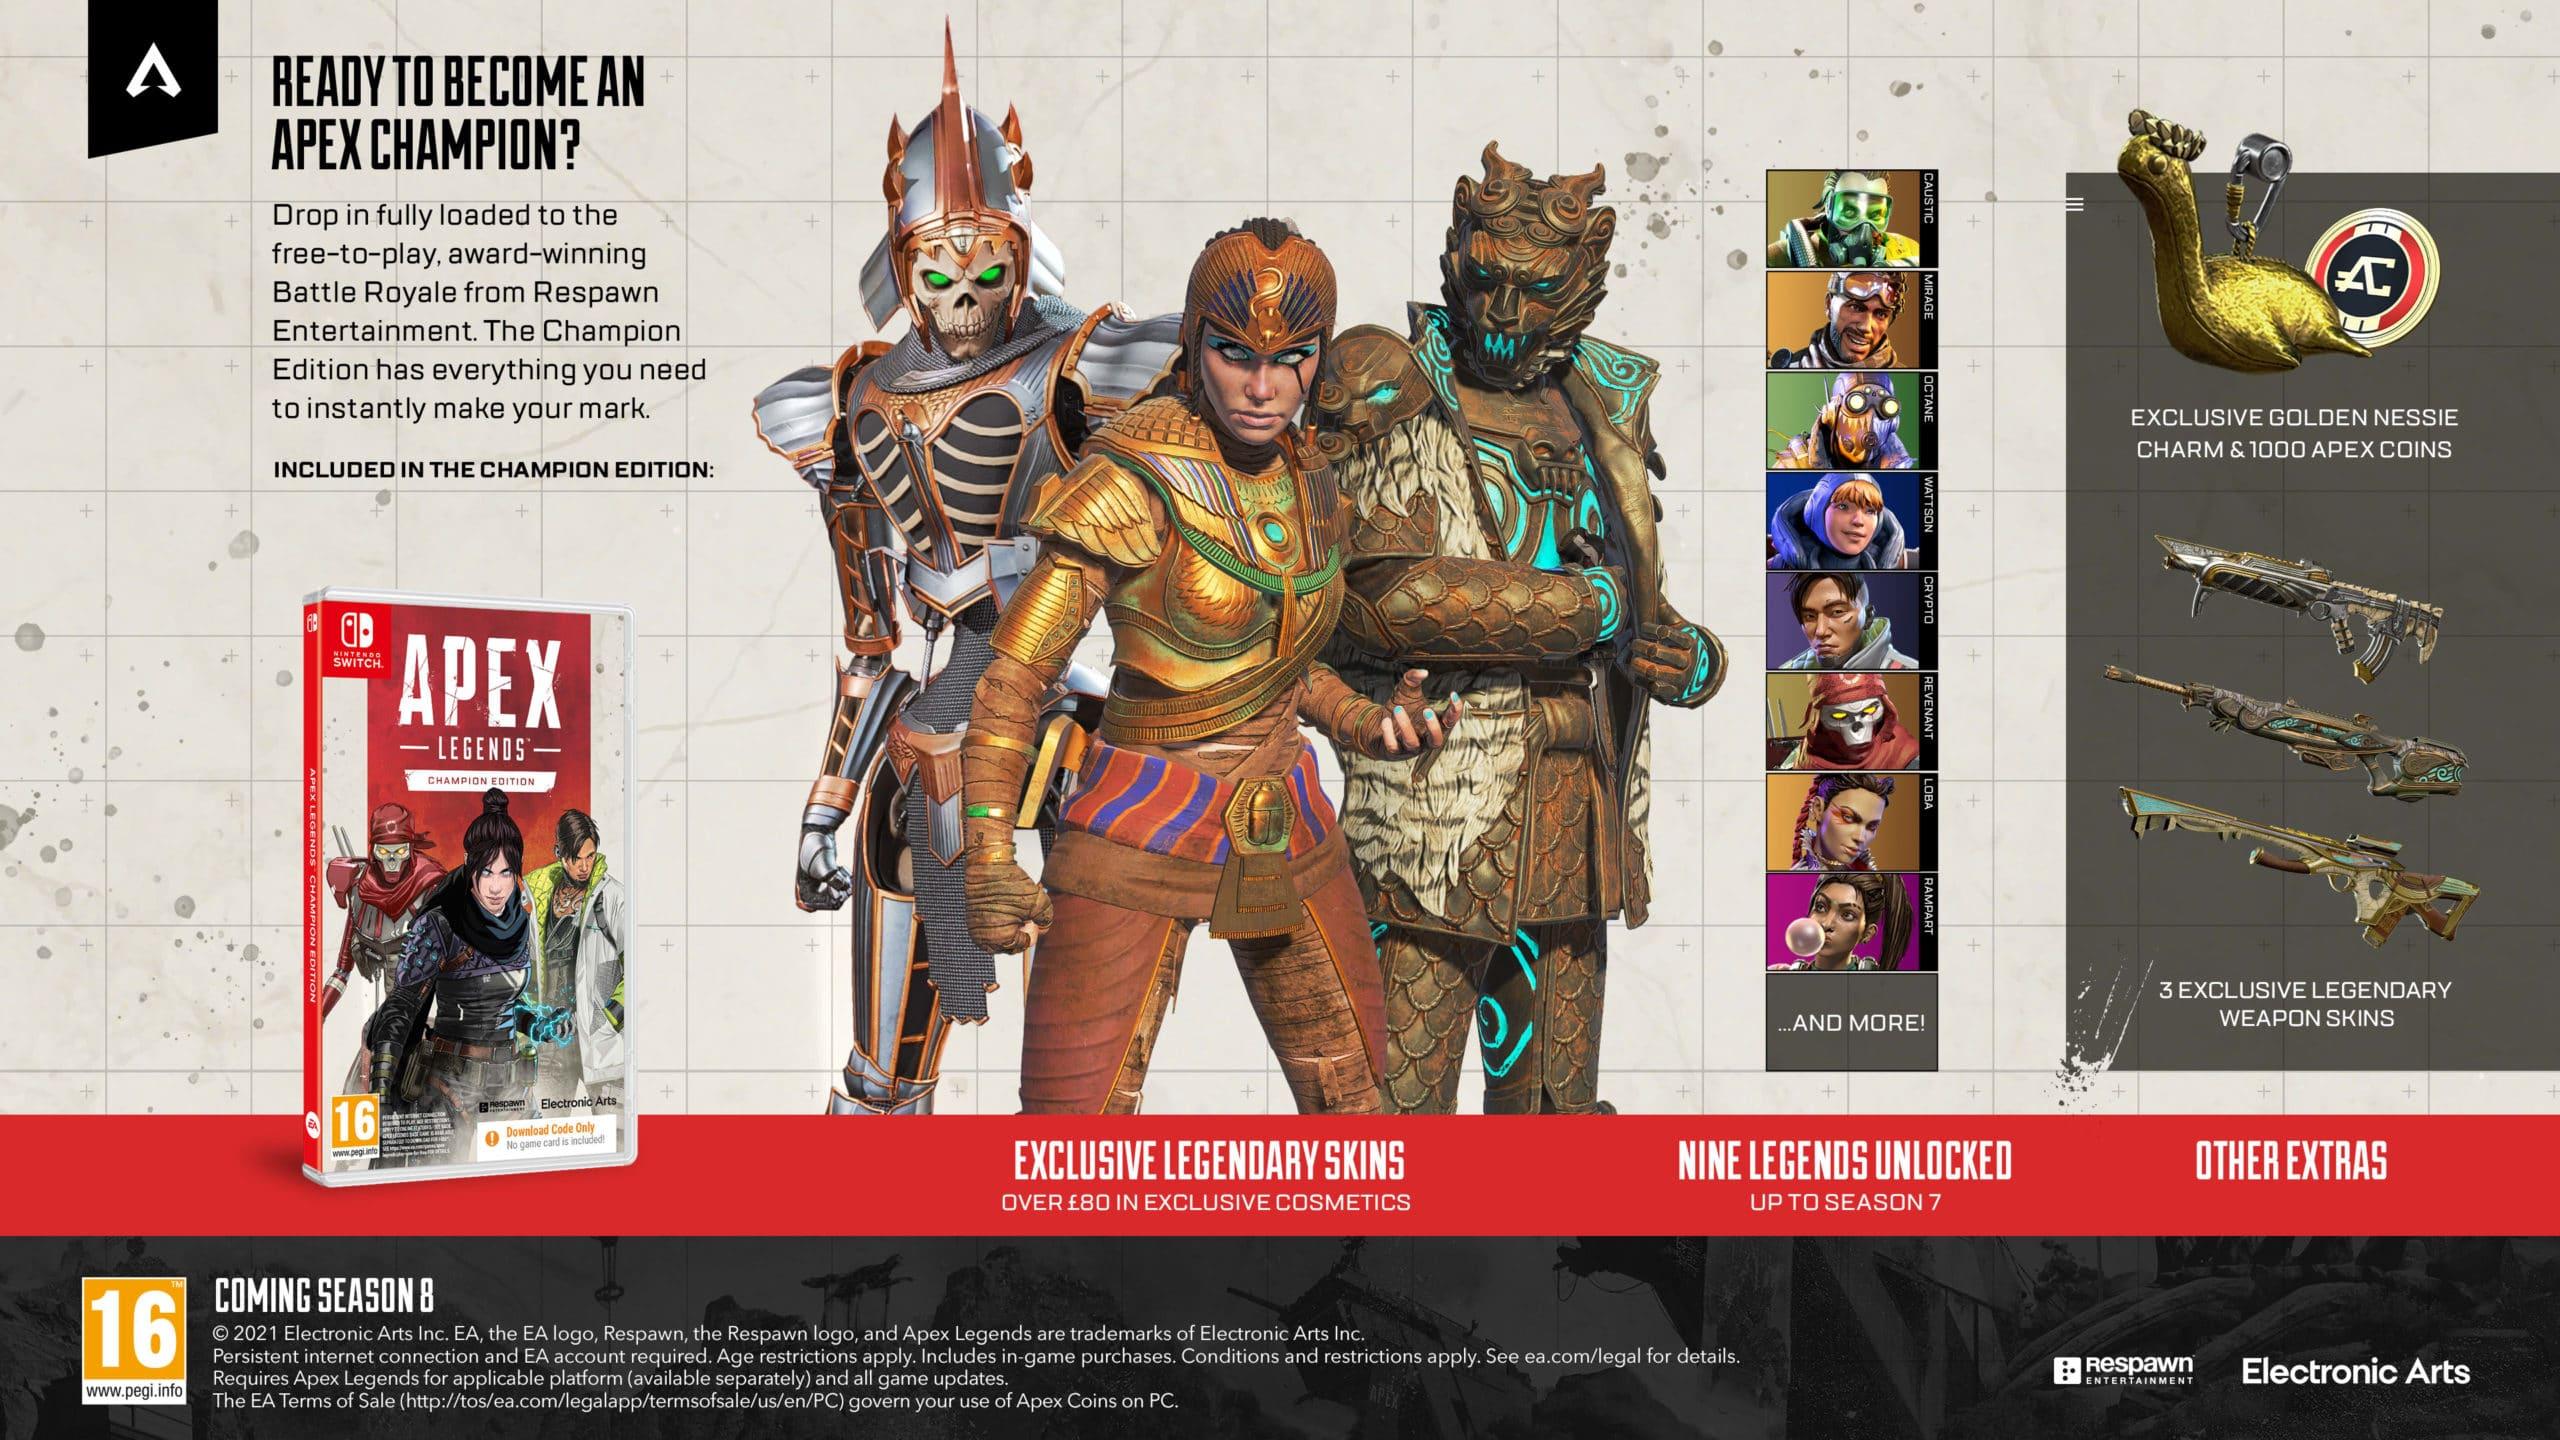 APEX Legends Champion Edition Info Graphic